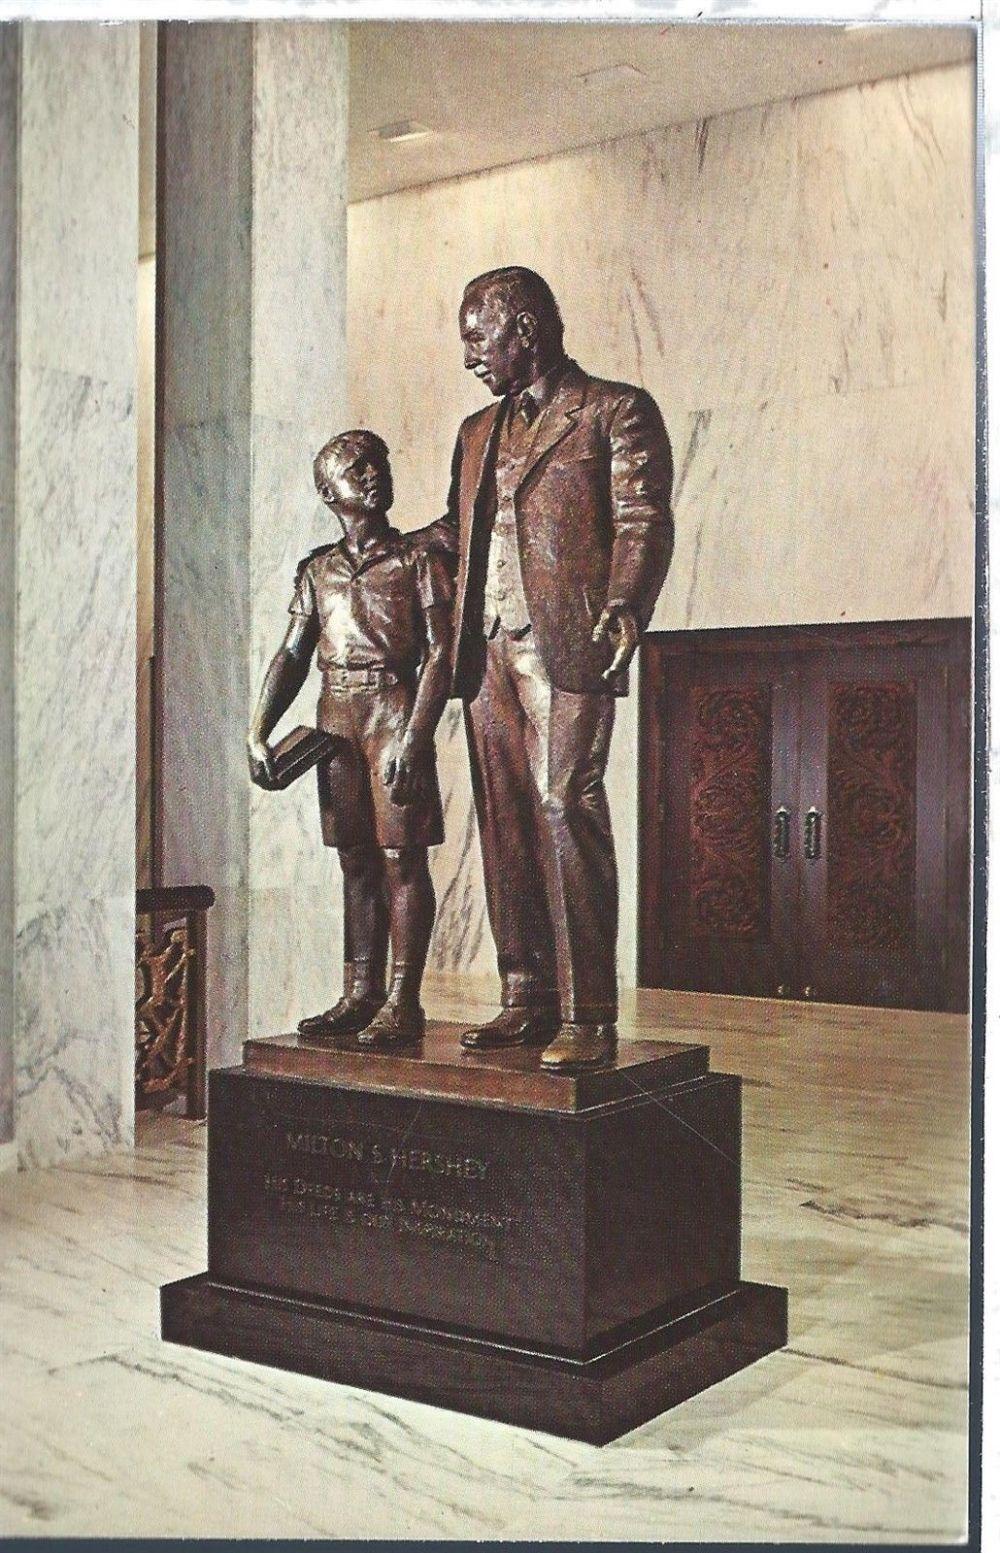 vintage-postcard-pennsylvania-pa-milton-hershey-school-statue-chrome-45661-770a3501b7a4c4234a94abaf0a9e264a